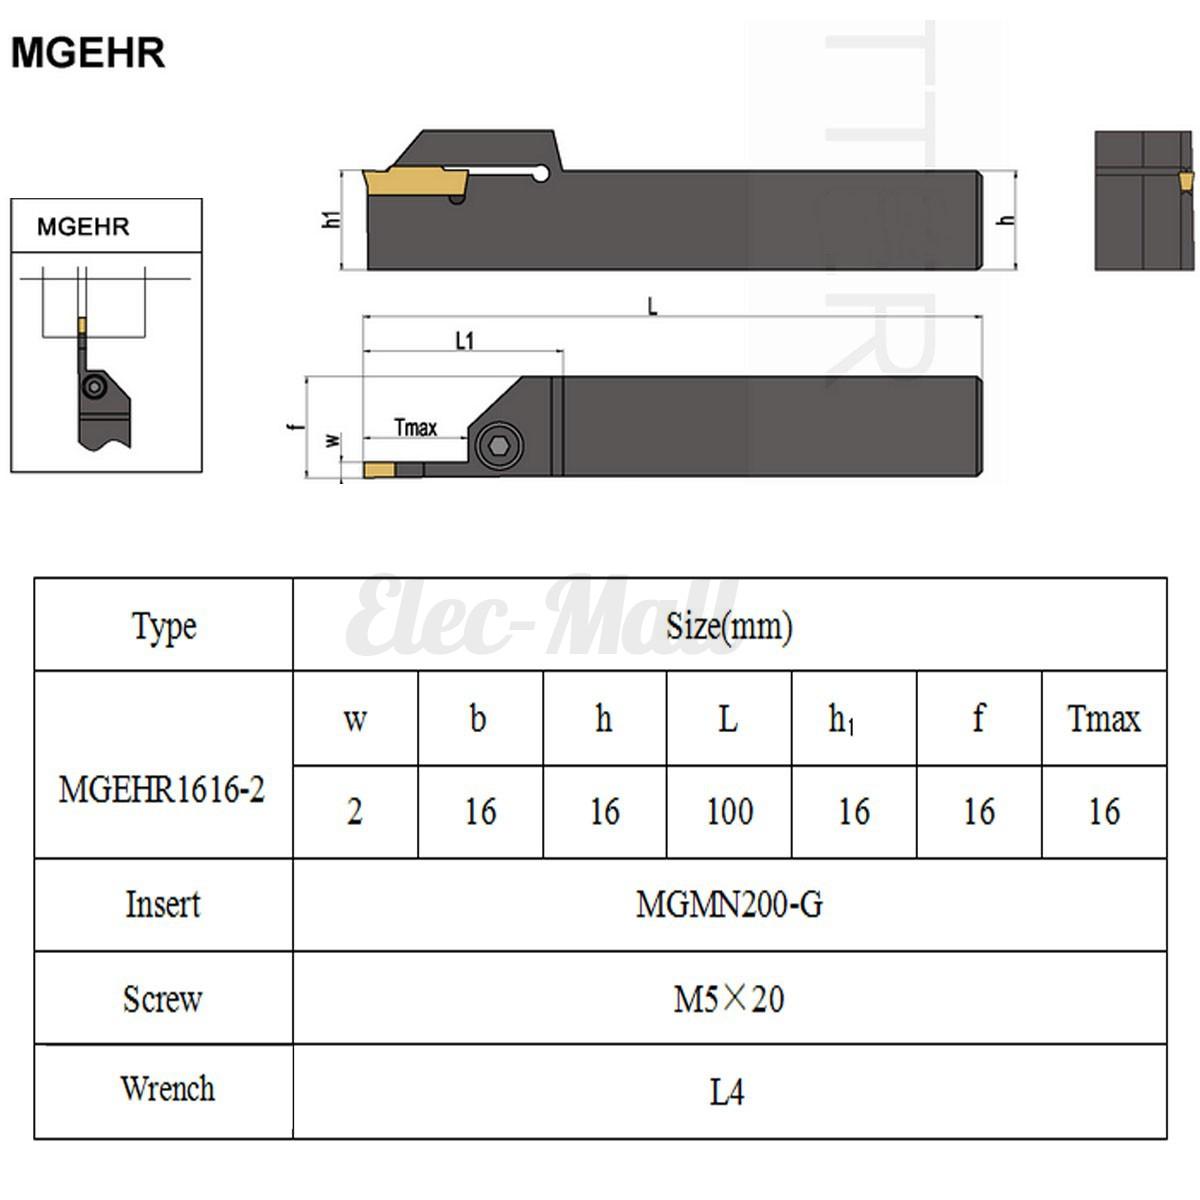 MGEHR1616-2 16x100mm CNC Lathe Turning Tool Holder 10PCS MGMN200 Inserts 2.0mm